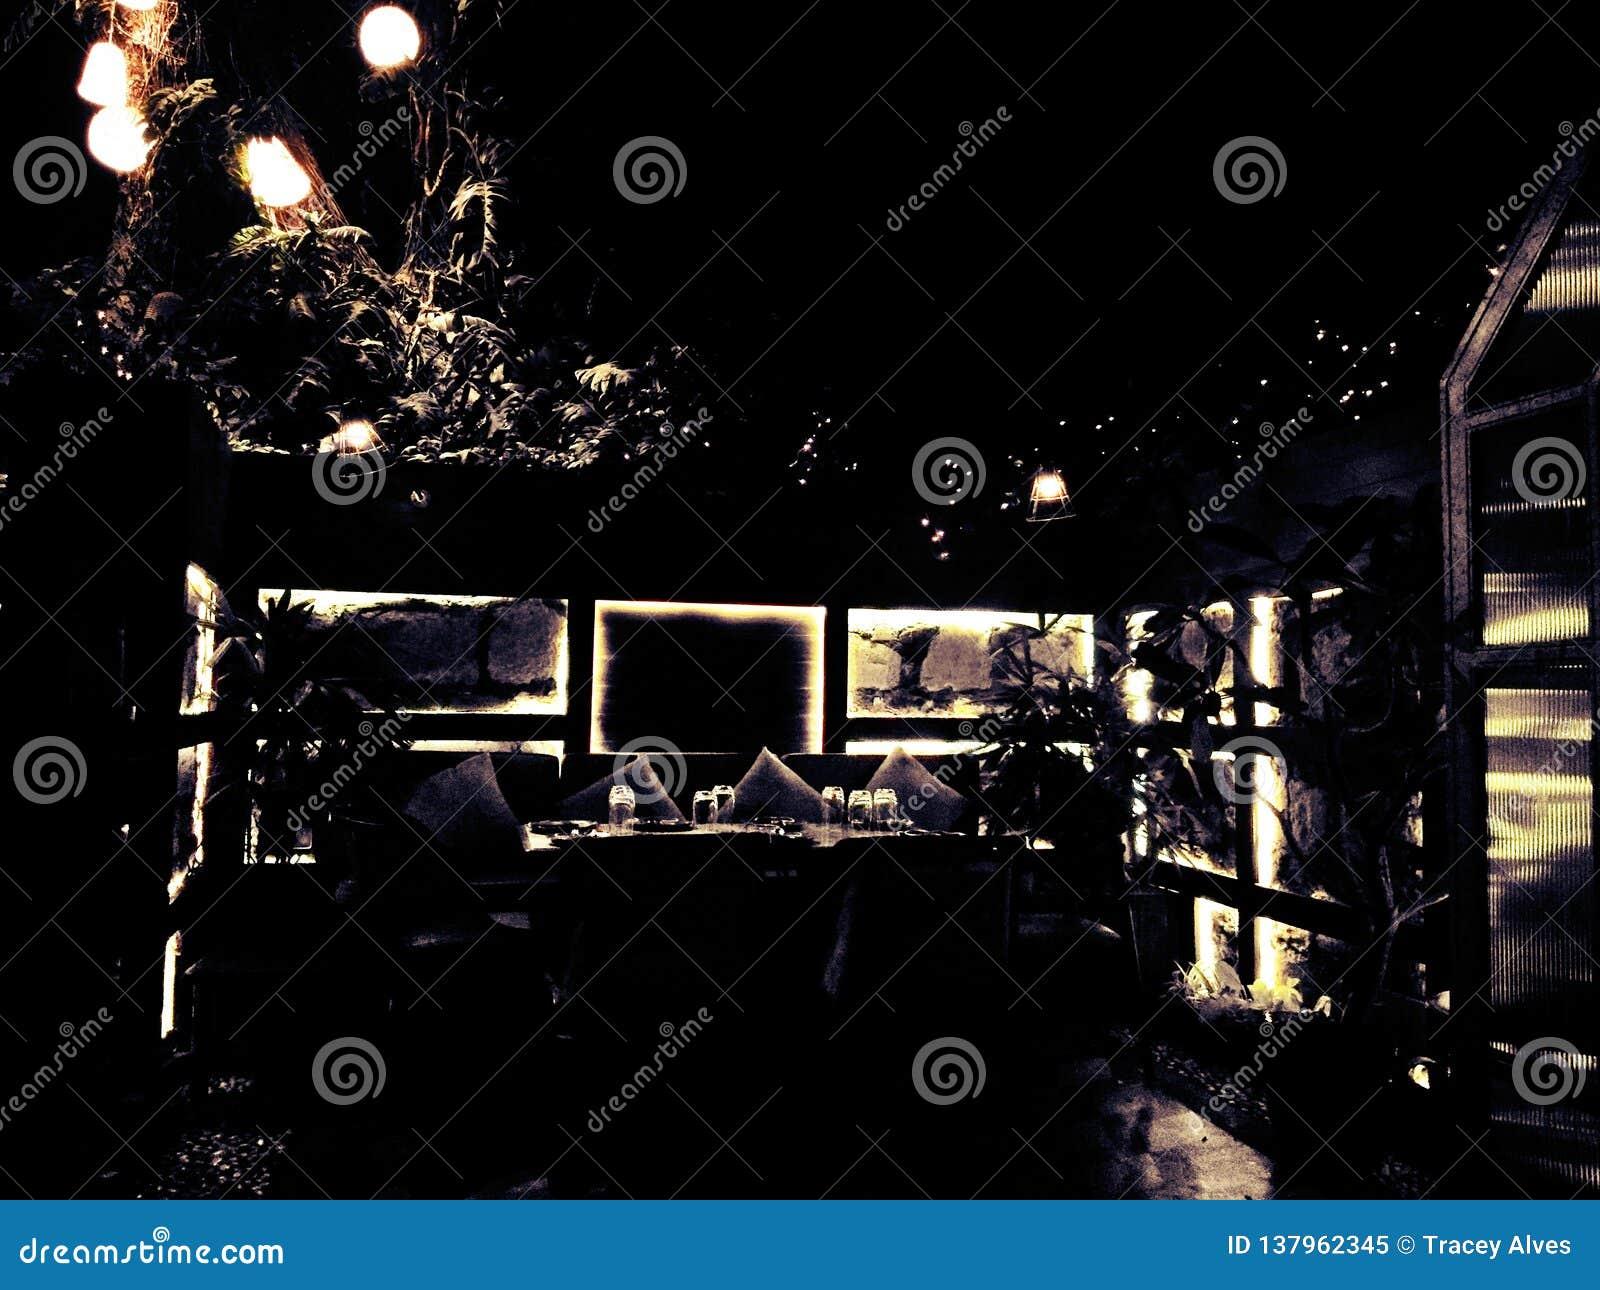 Dineer in dark